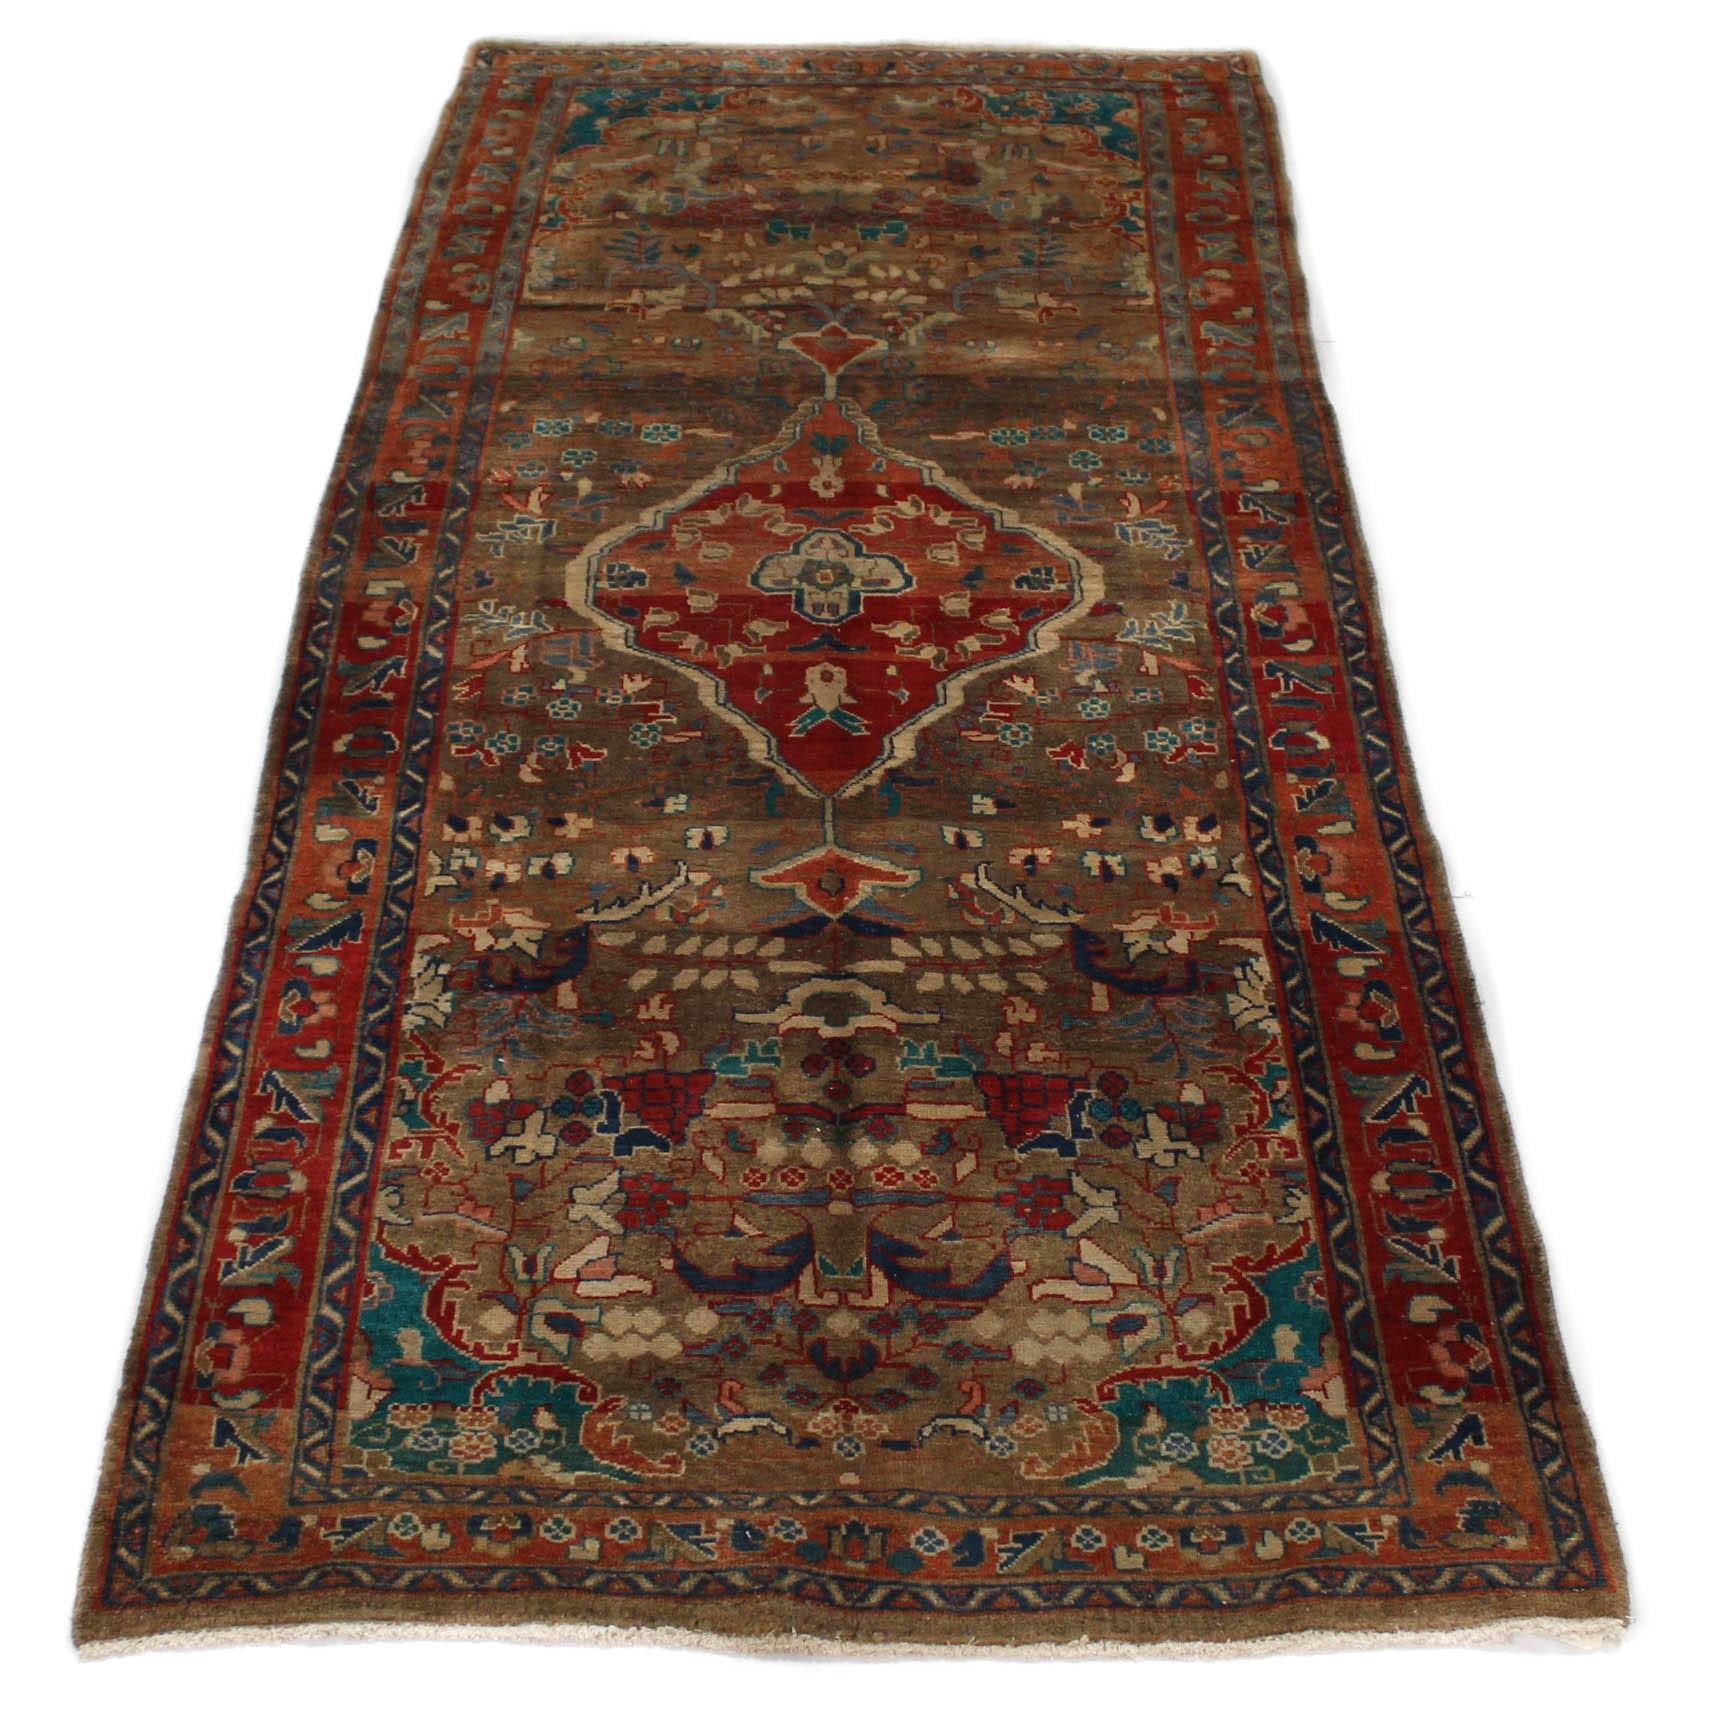 Semi-Antique Hand-Knotted Persian Bijar Long Rug